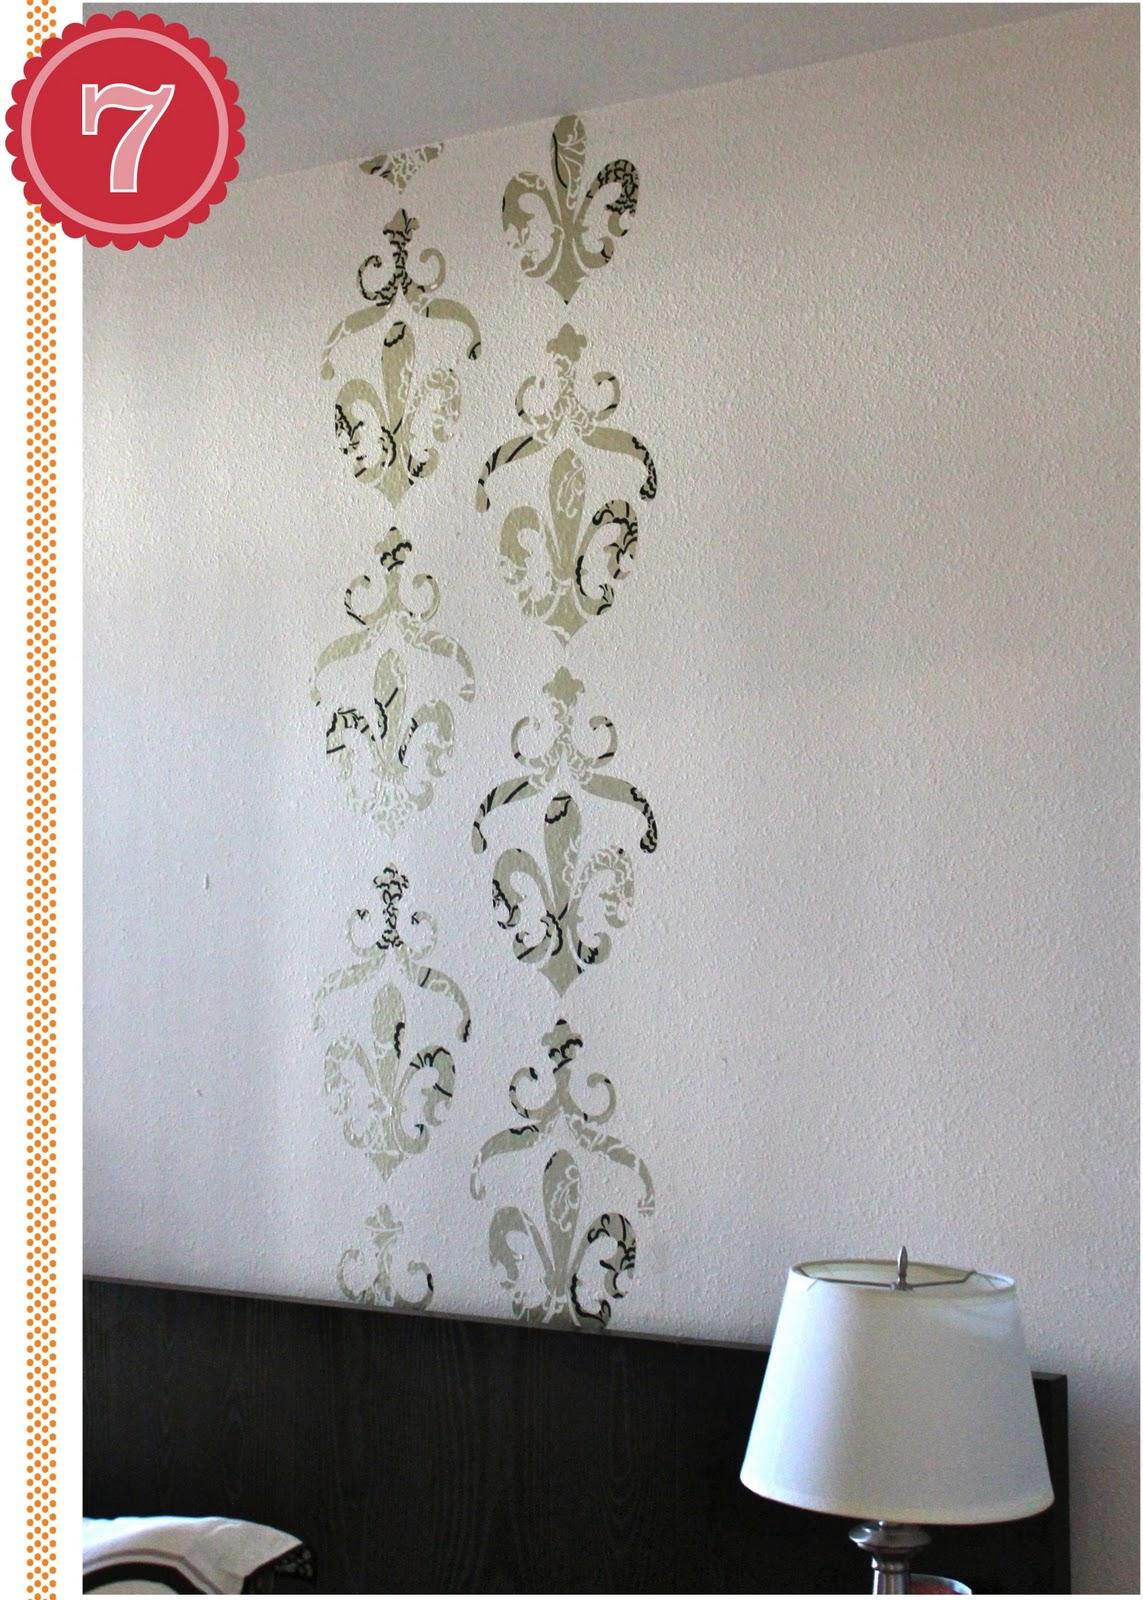 http://4.bp.blogspot.com/-L3Ci2ouNfxk/TxiImo08R5I/AAAAAAAABX8/wJW_TYbrCec/s1600/DIY+Wall+Decals-010.jpg